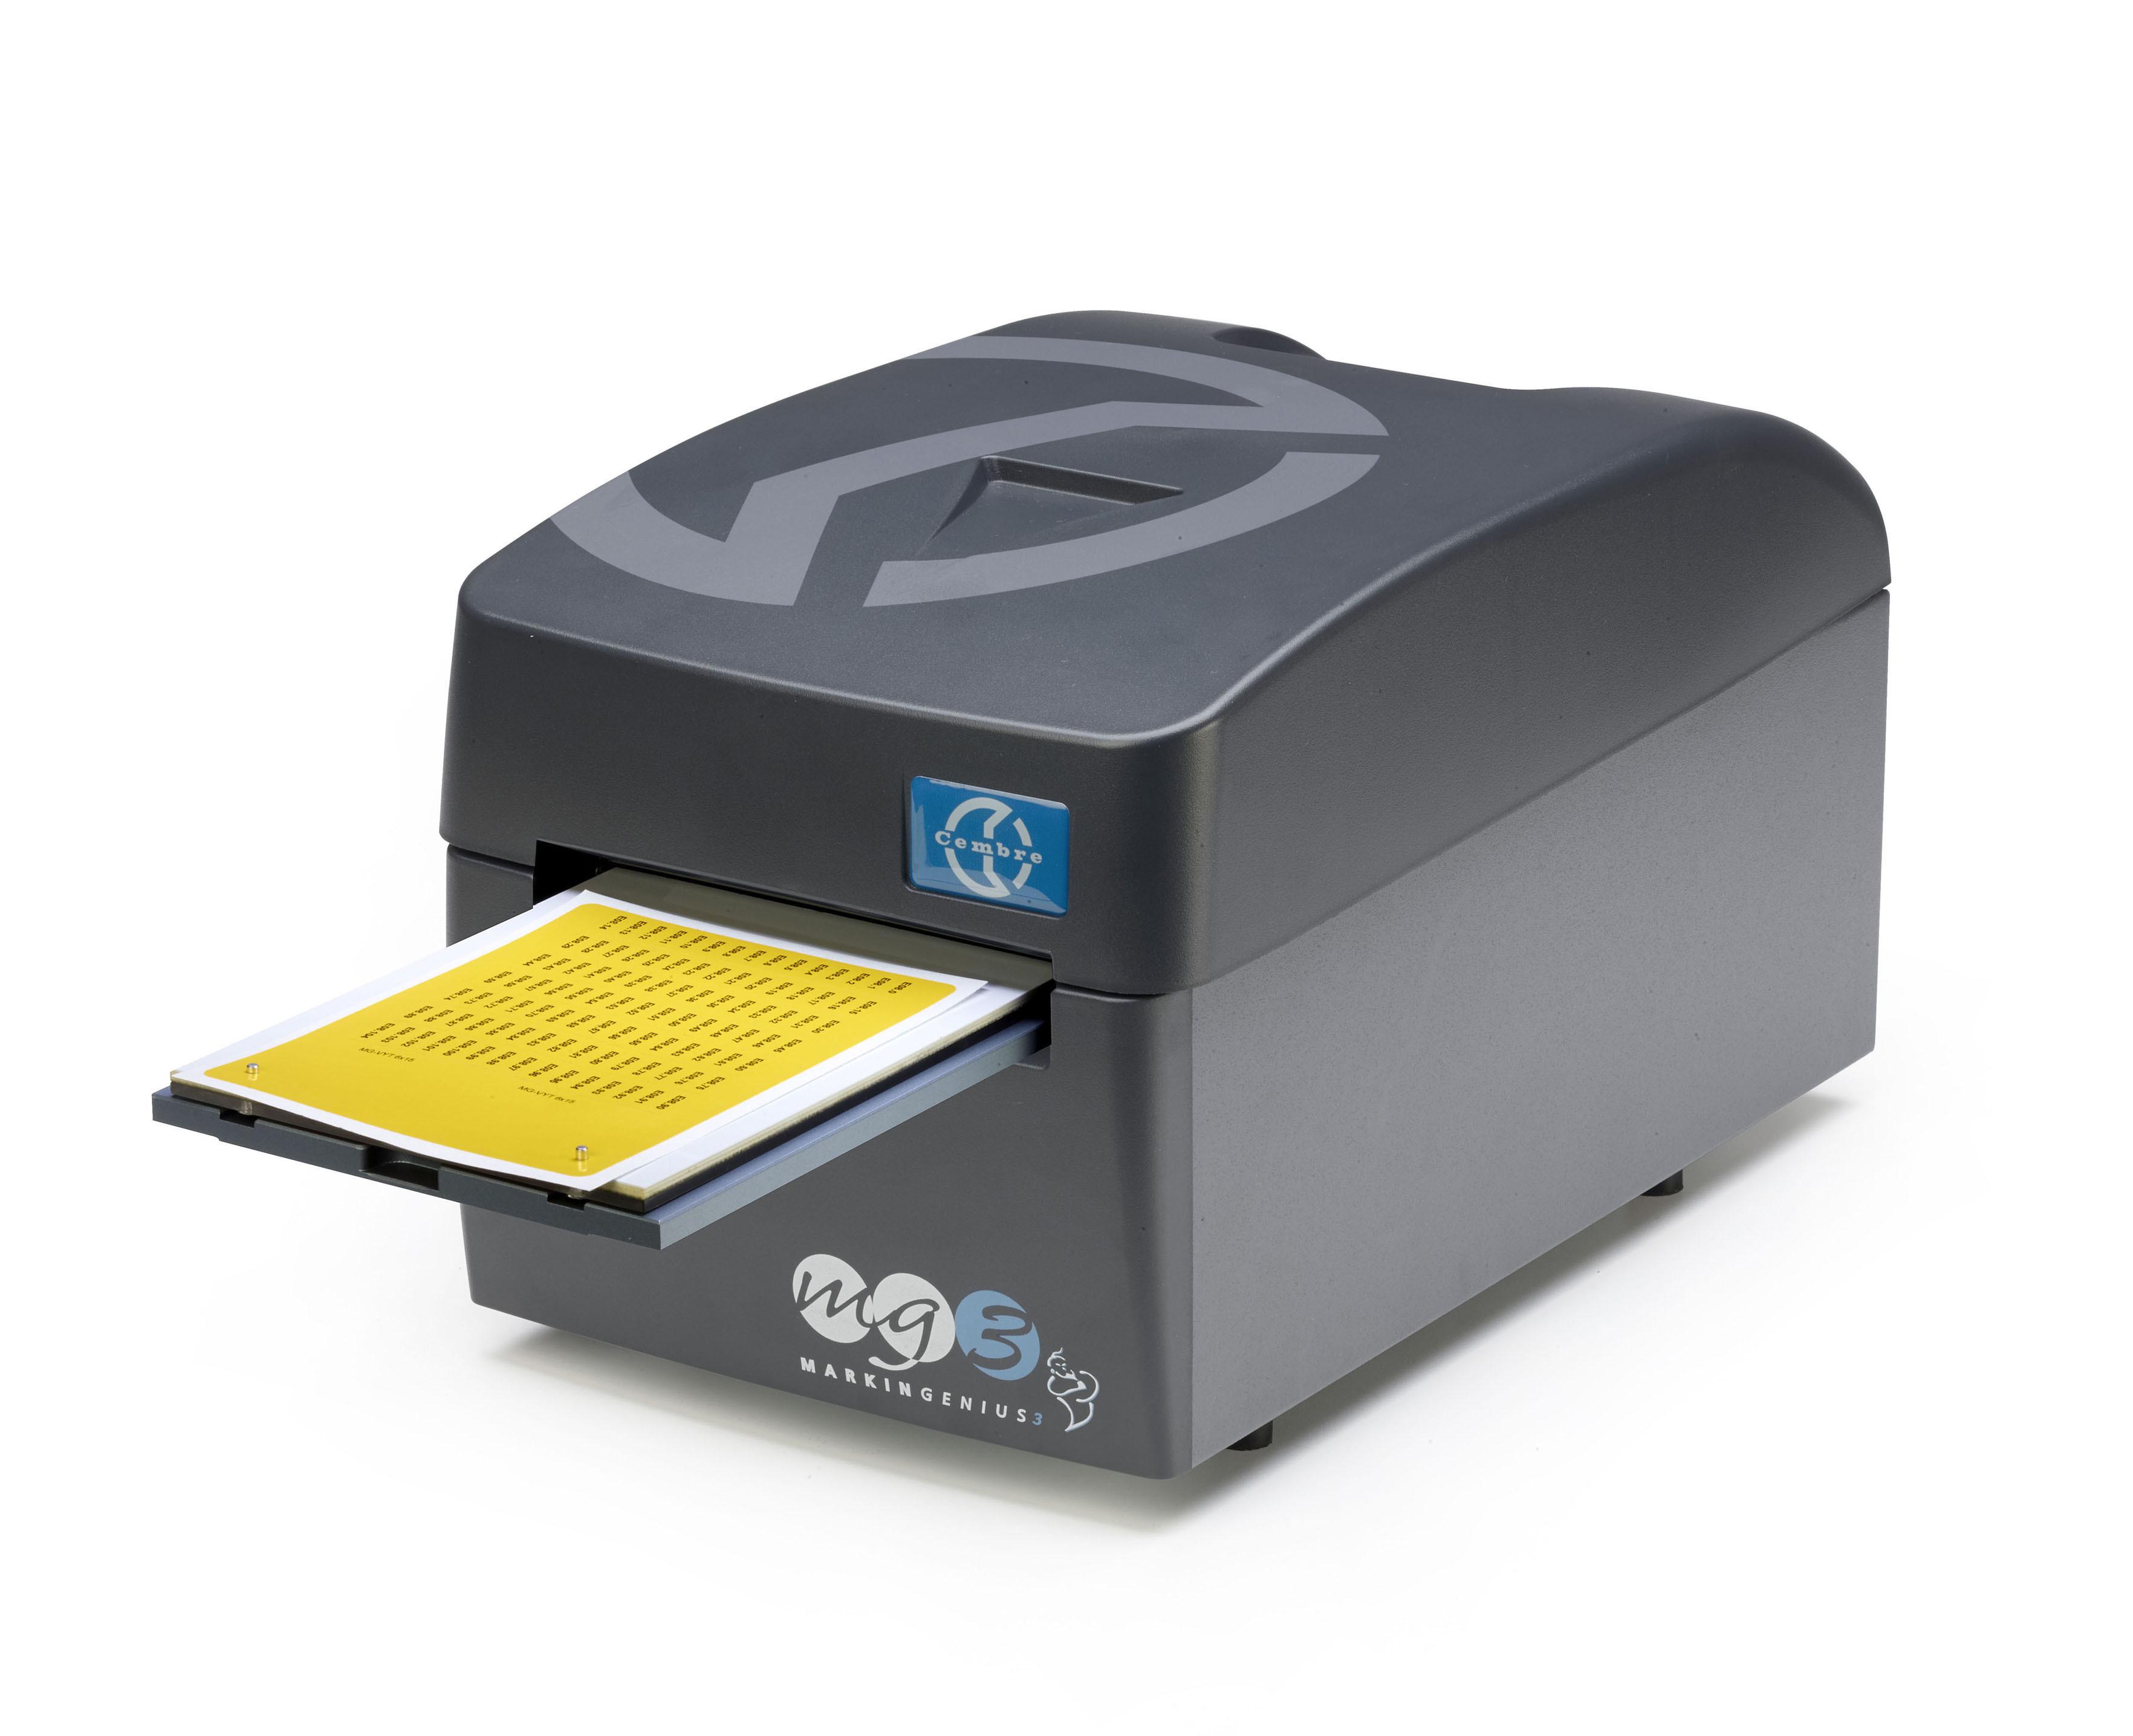 Cembre Mg3 Markingenius Printer Free Install